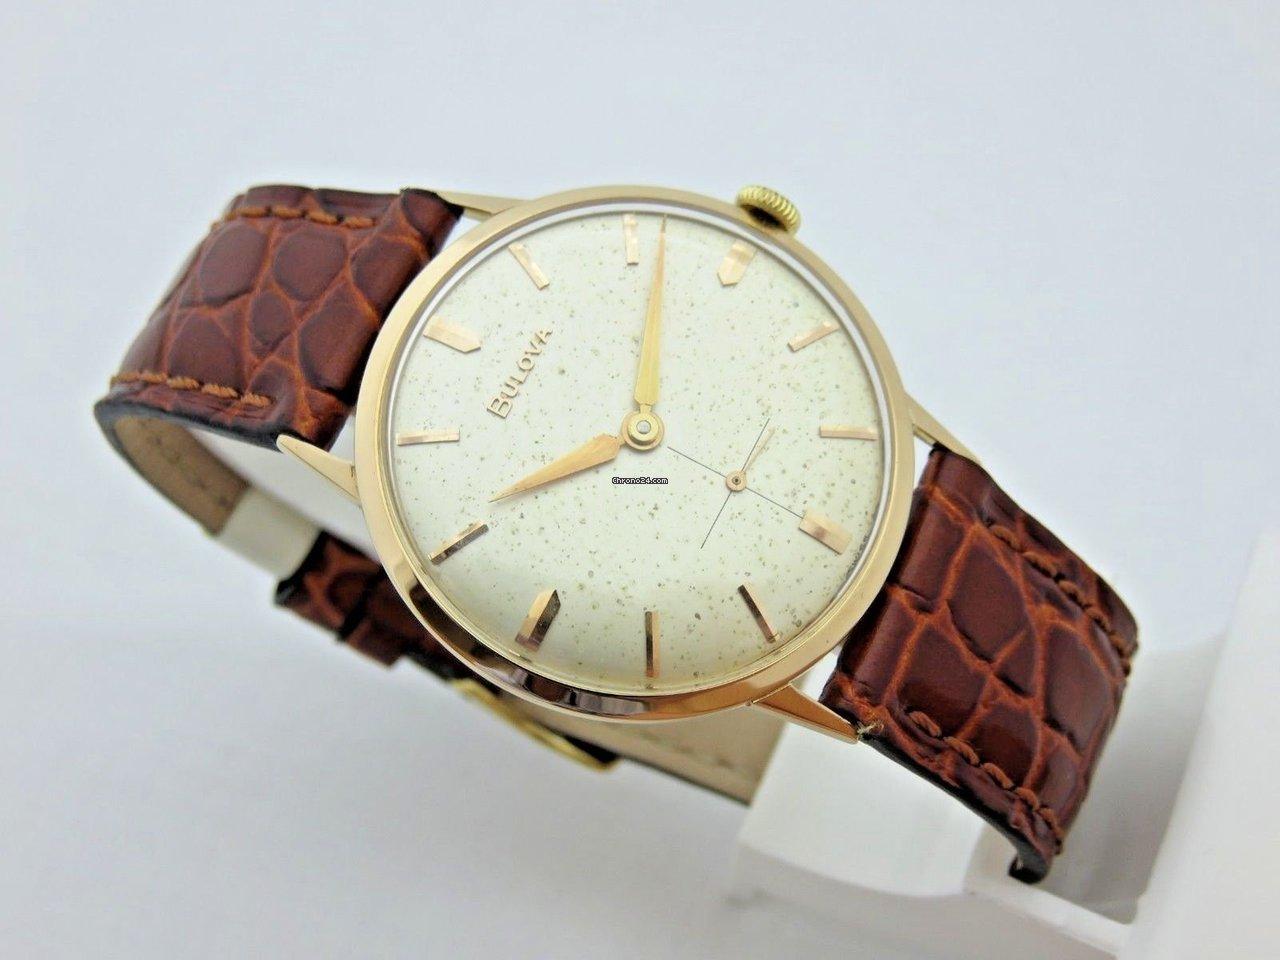 lusso cerca il meglio vendita di liquidazione Bulova 18 kt rose gold man watch 33,5mm manual winding serviced